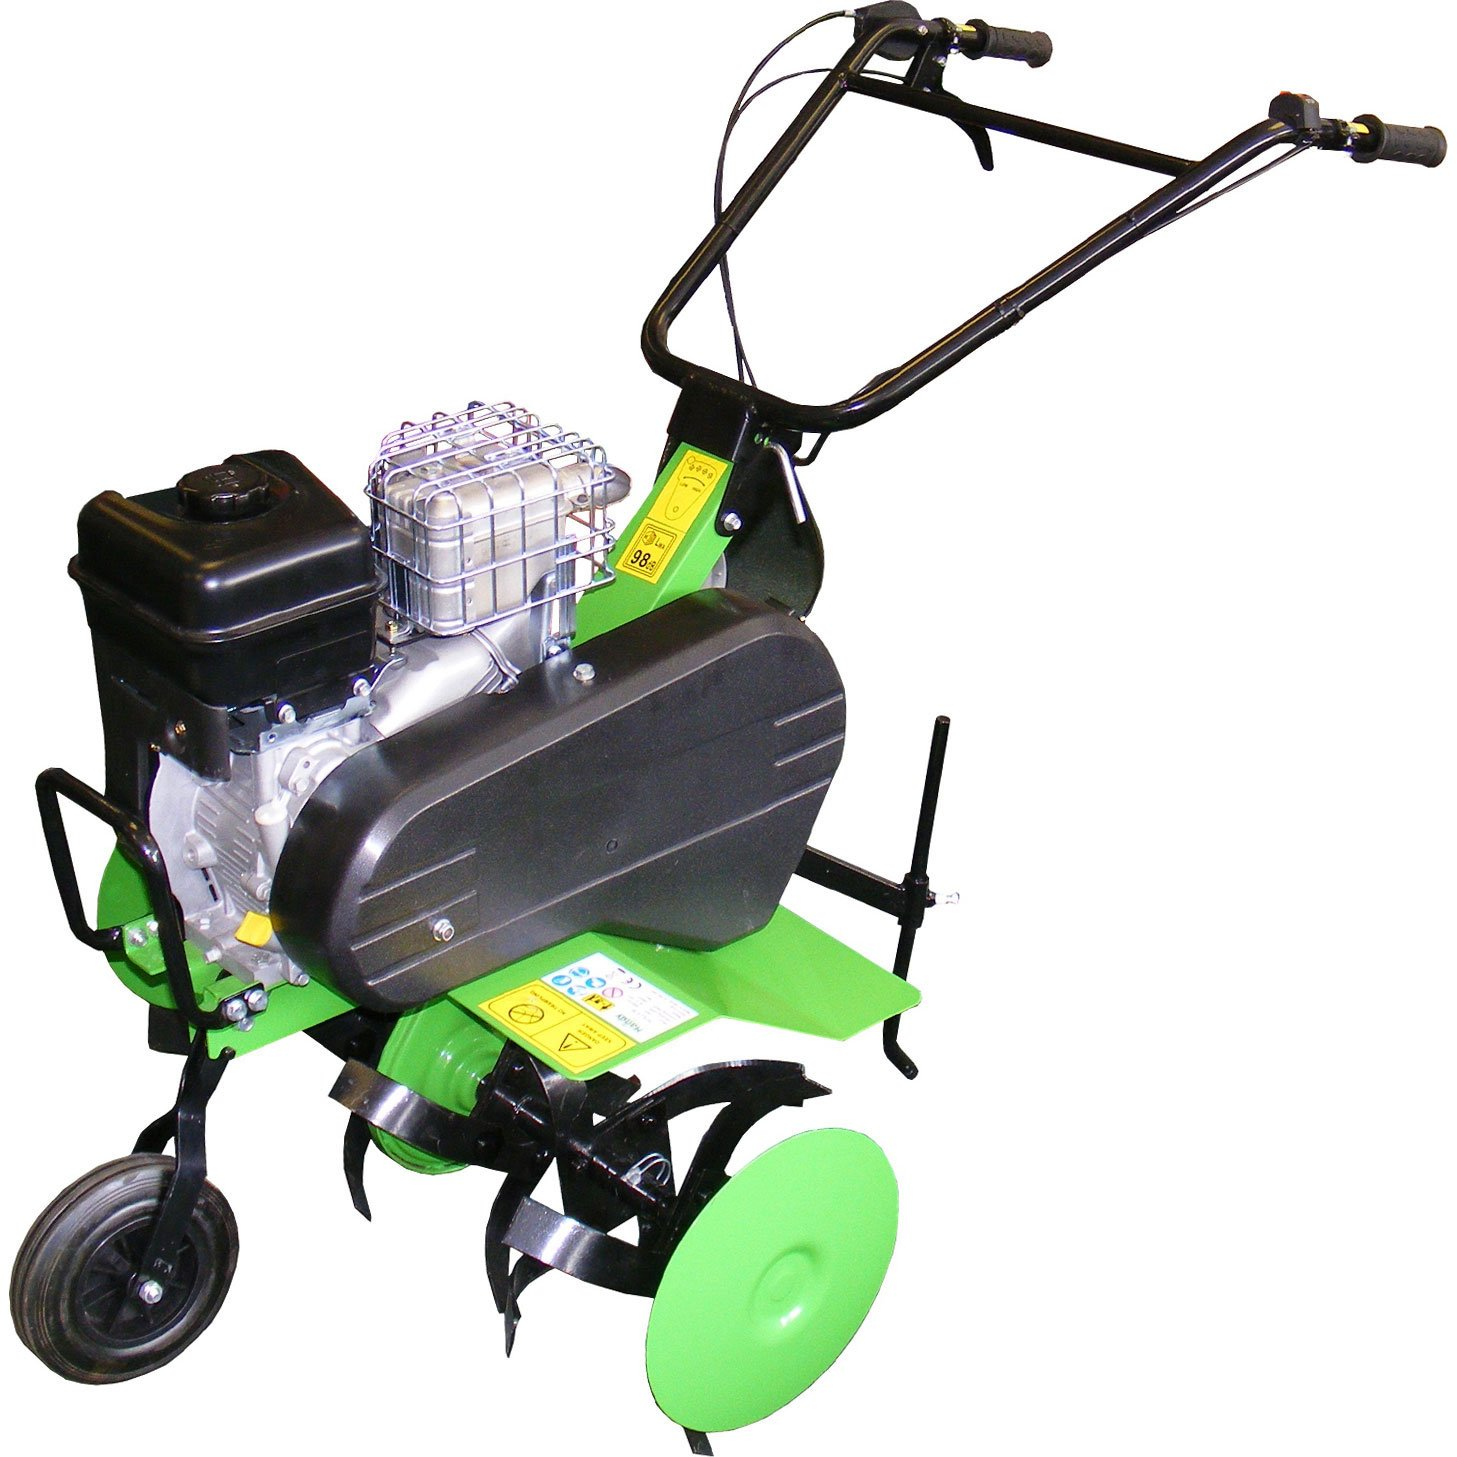 Handy 65 Petrol Tiller Garden Outdoors Have A Briggs Stration Four Horsepower I Trried